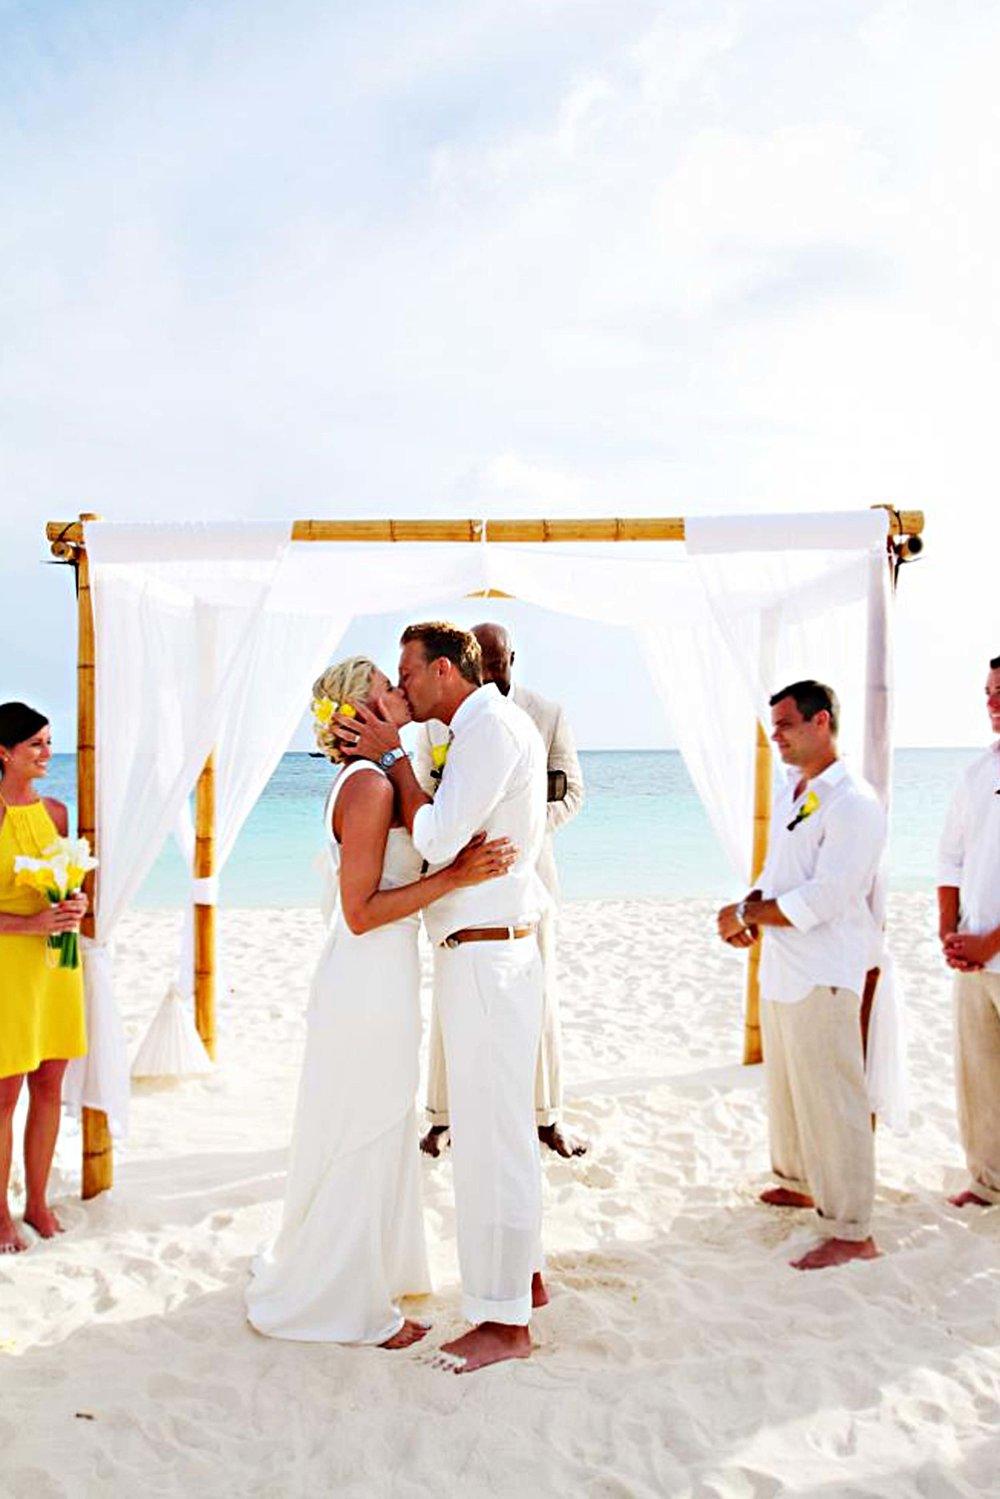 weddings-aruba-11.jpg